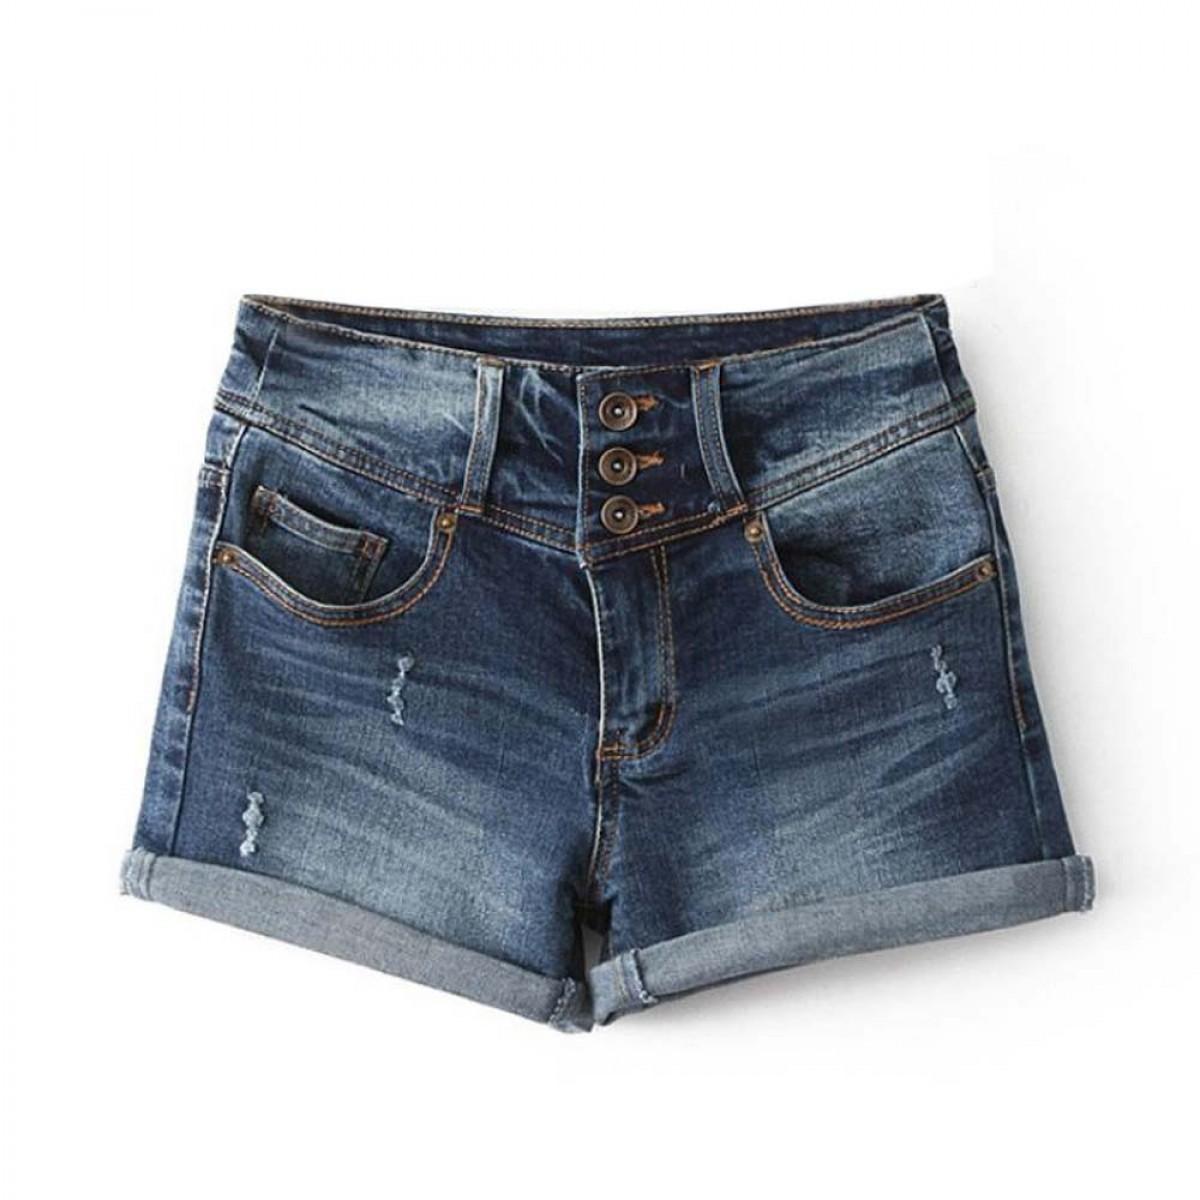 Classic 90 s Denim Shorts Women Loose Fit | LATICCI